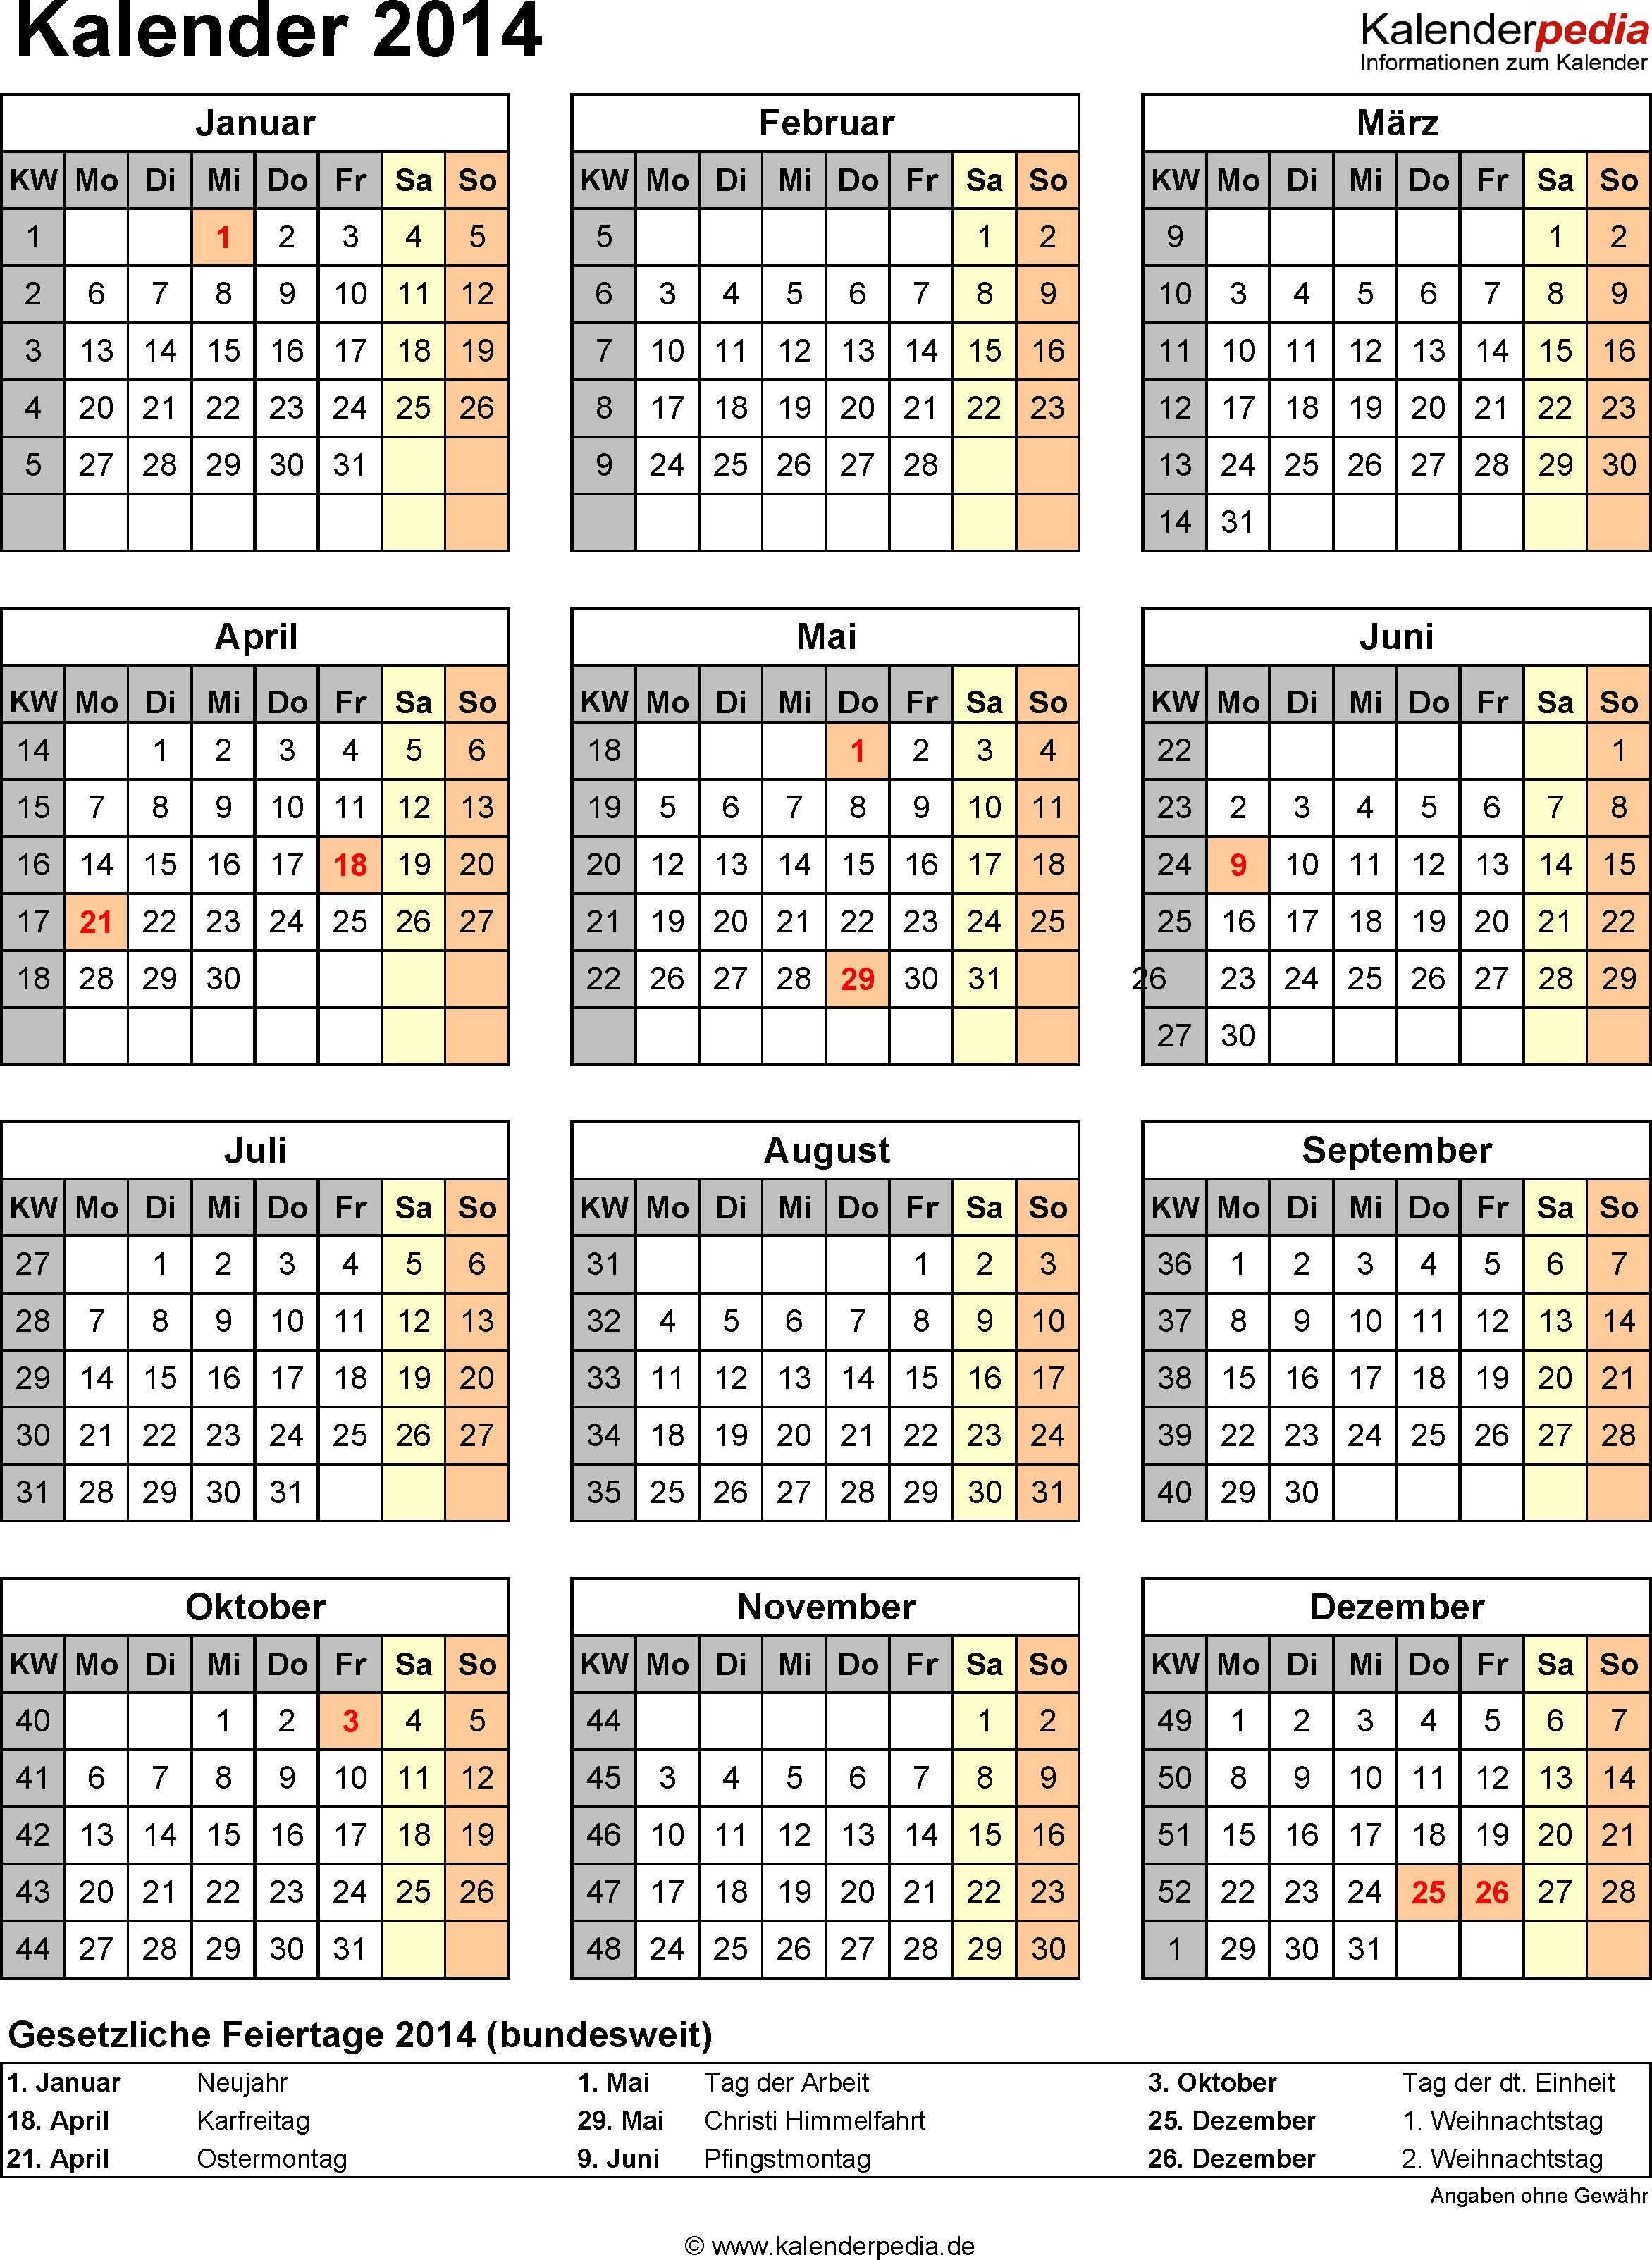 Kalender 2014 im Hochformat